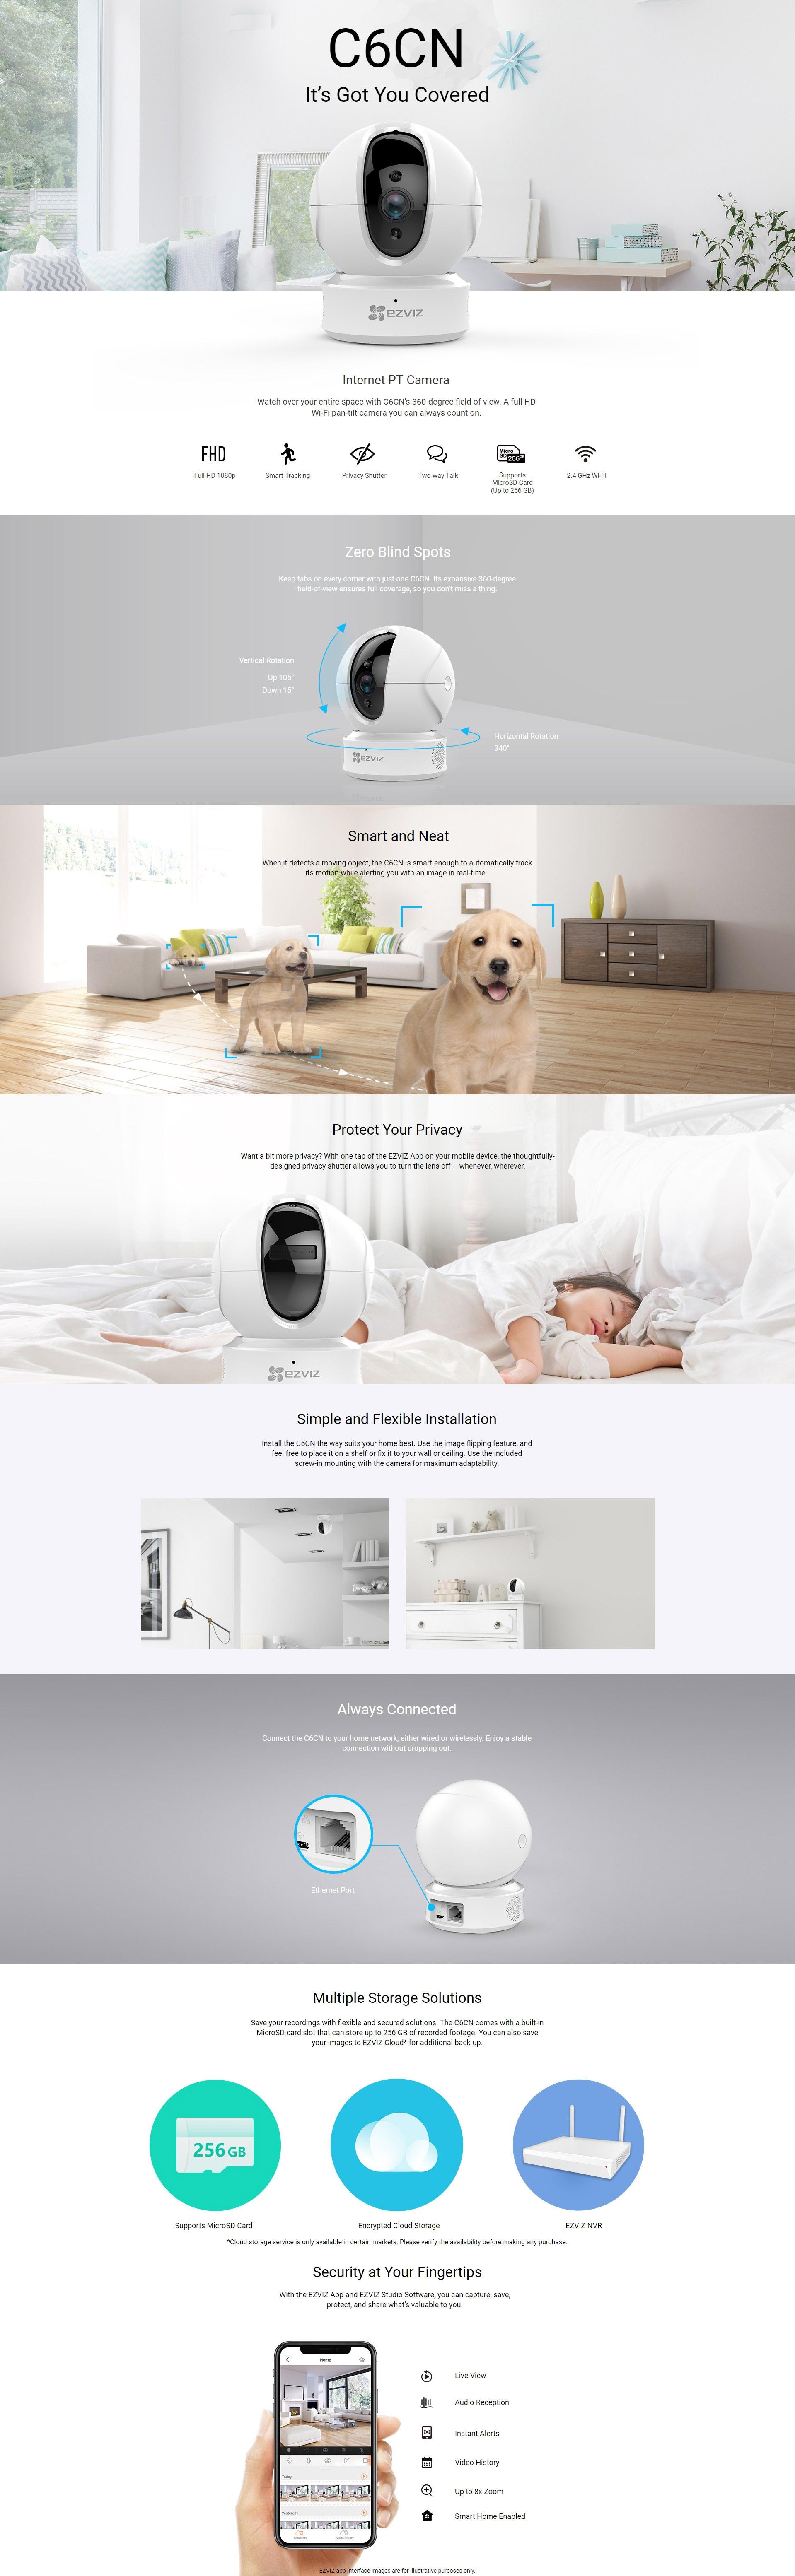 EZVIZ C6CN 1080P Full HD Resolution Pan & Tilt Wireless Security Camera